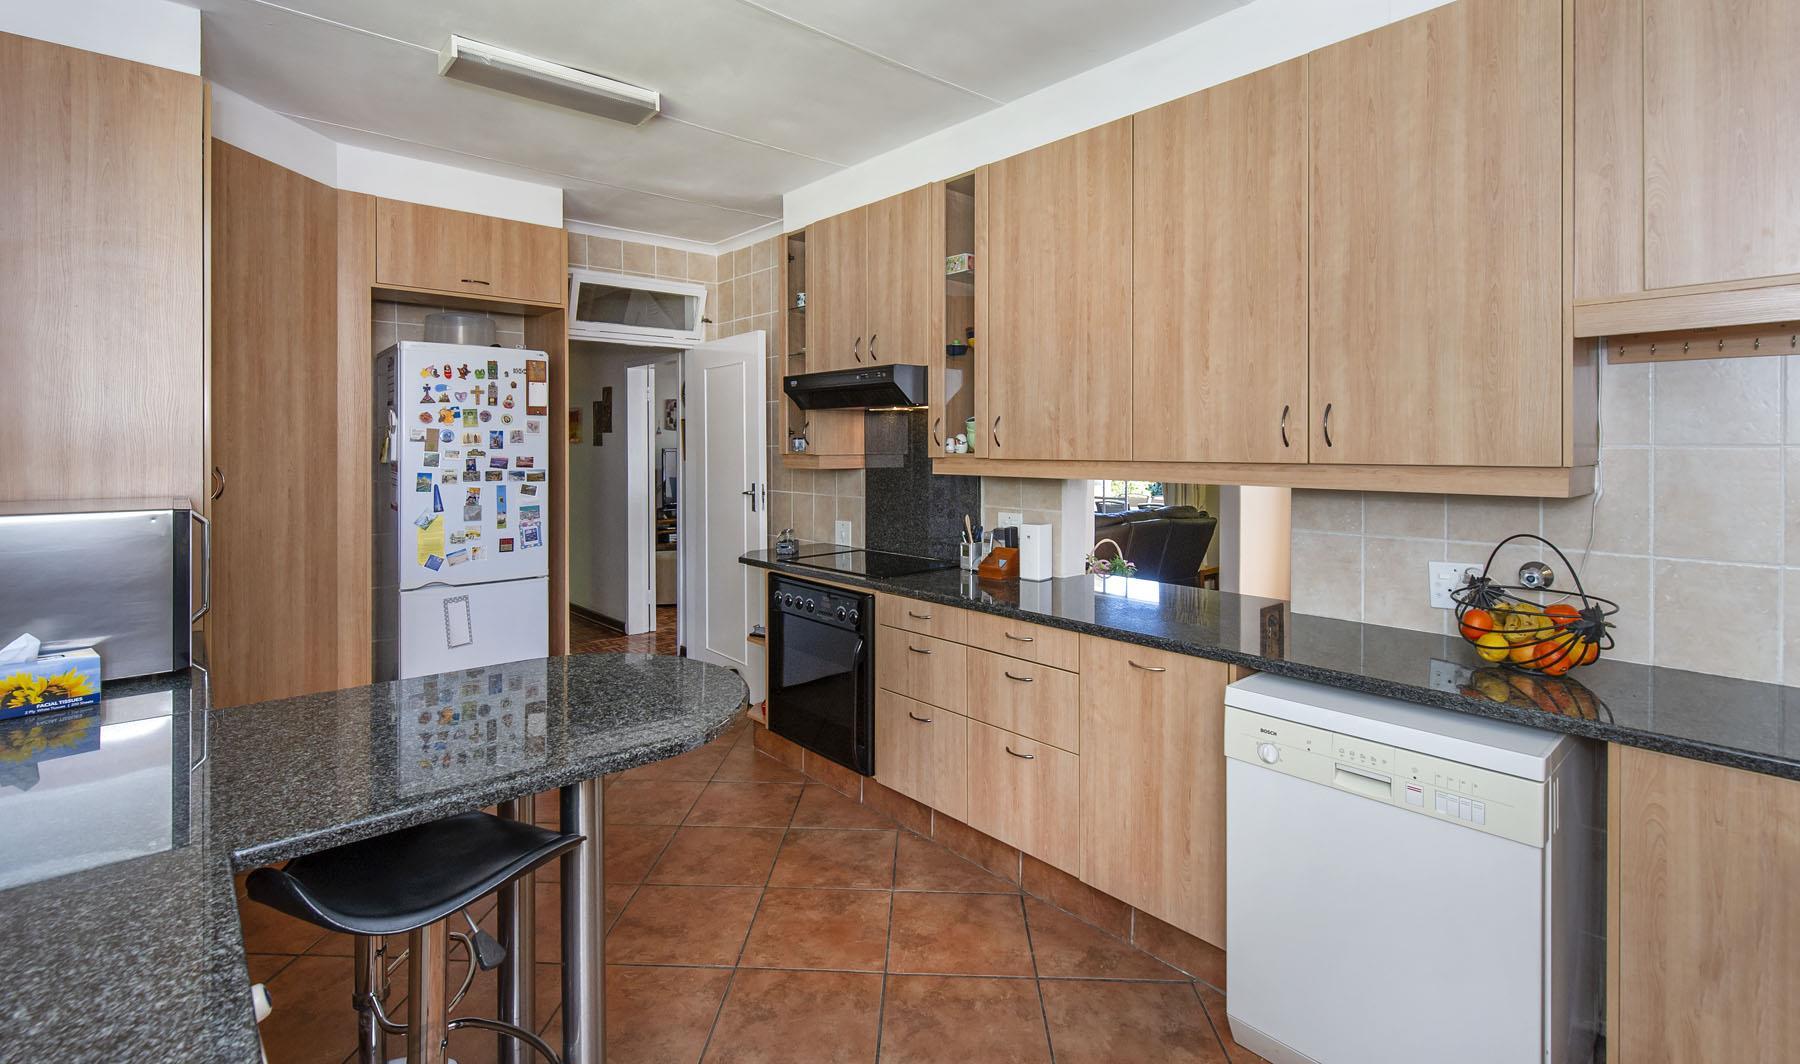 3 Bedroom House For Sale in Eden Glen